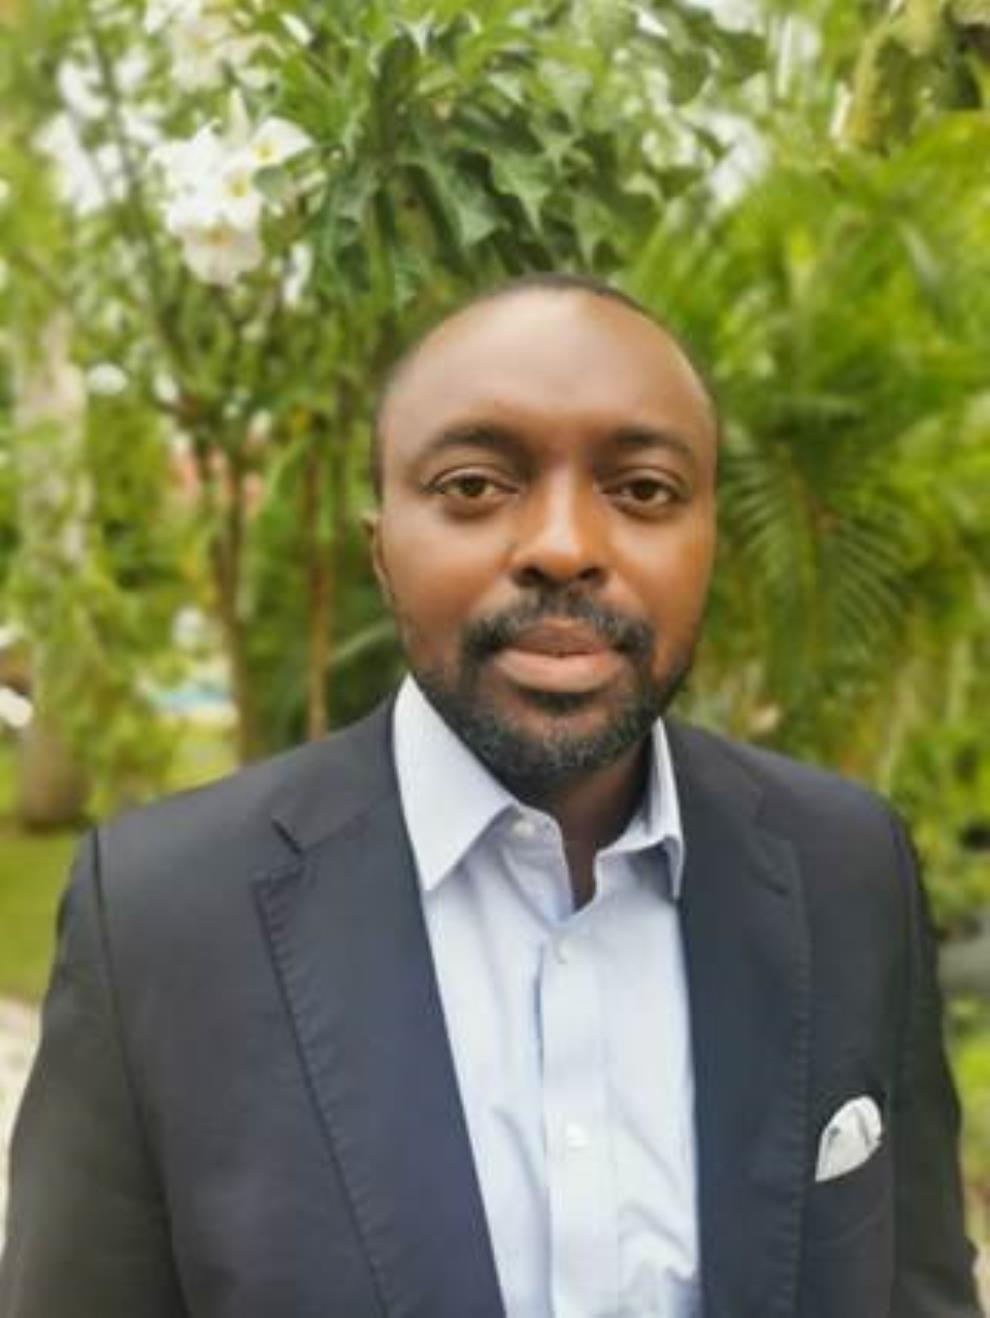 Abdulai Awudu, General Manager of Joy Learning